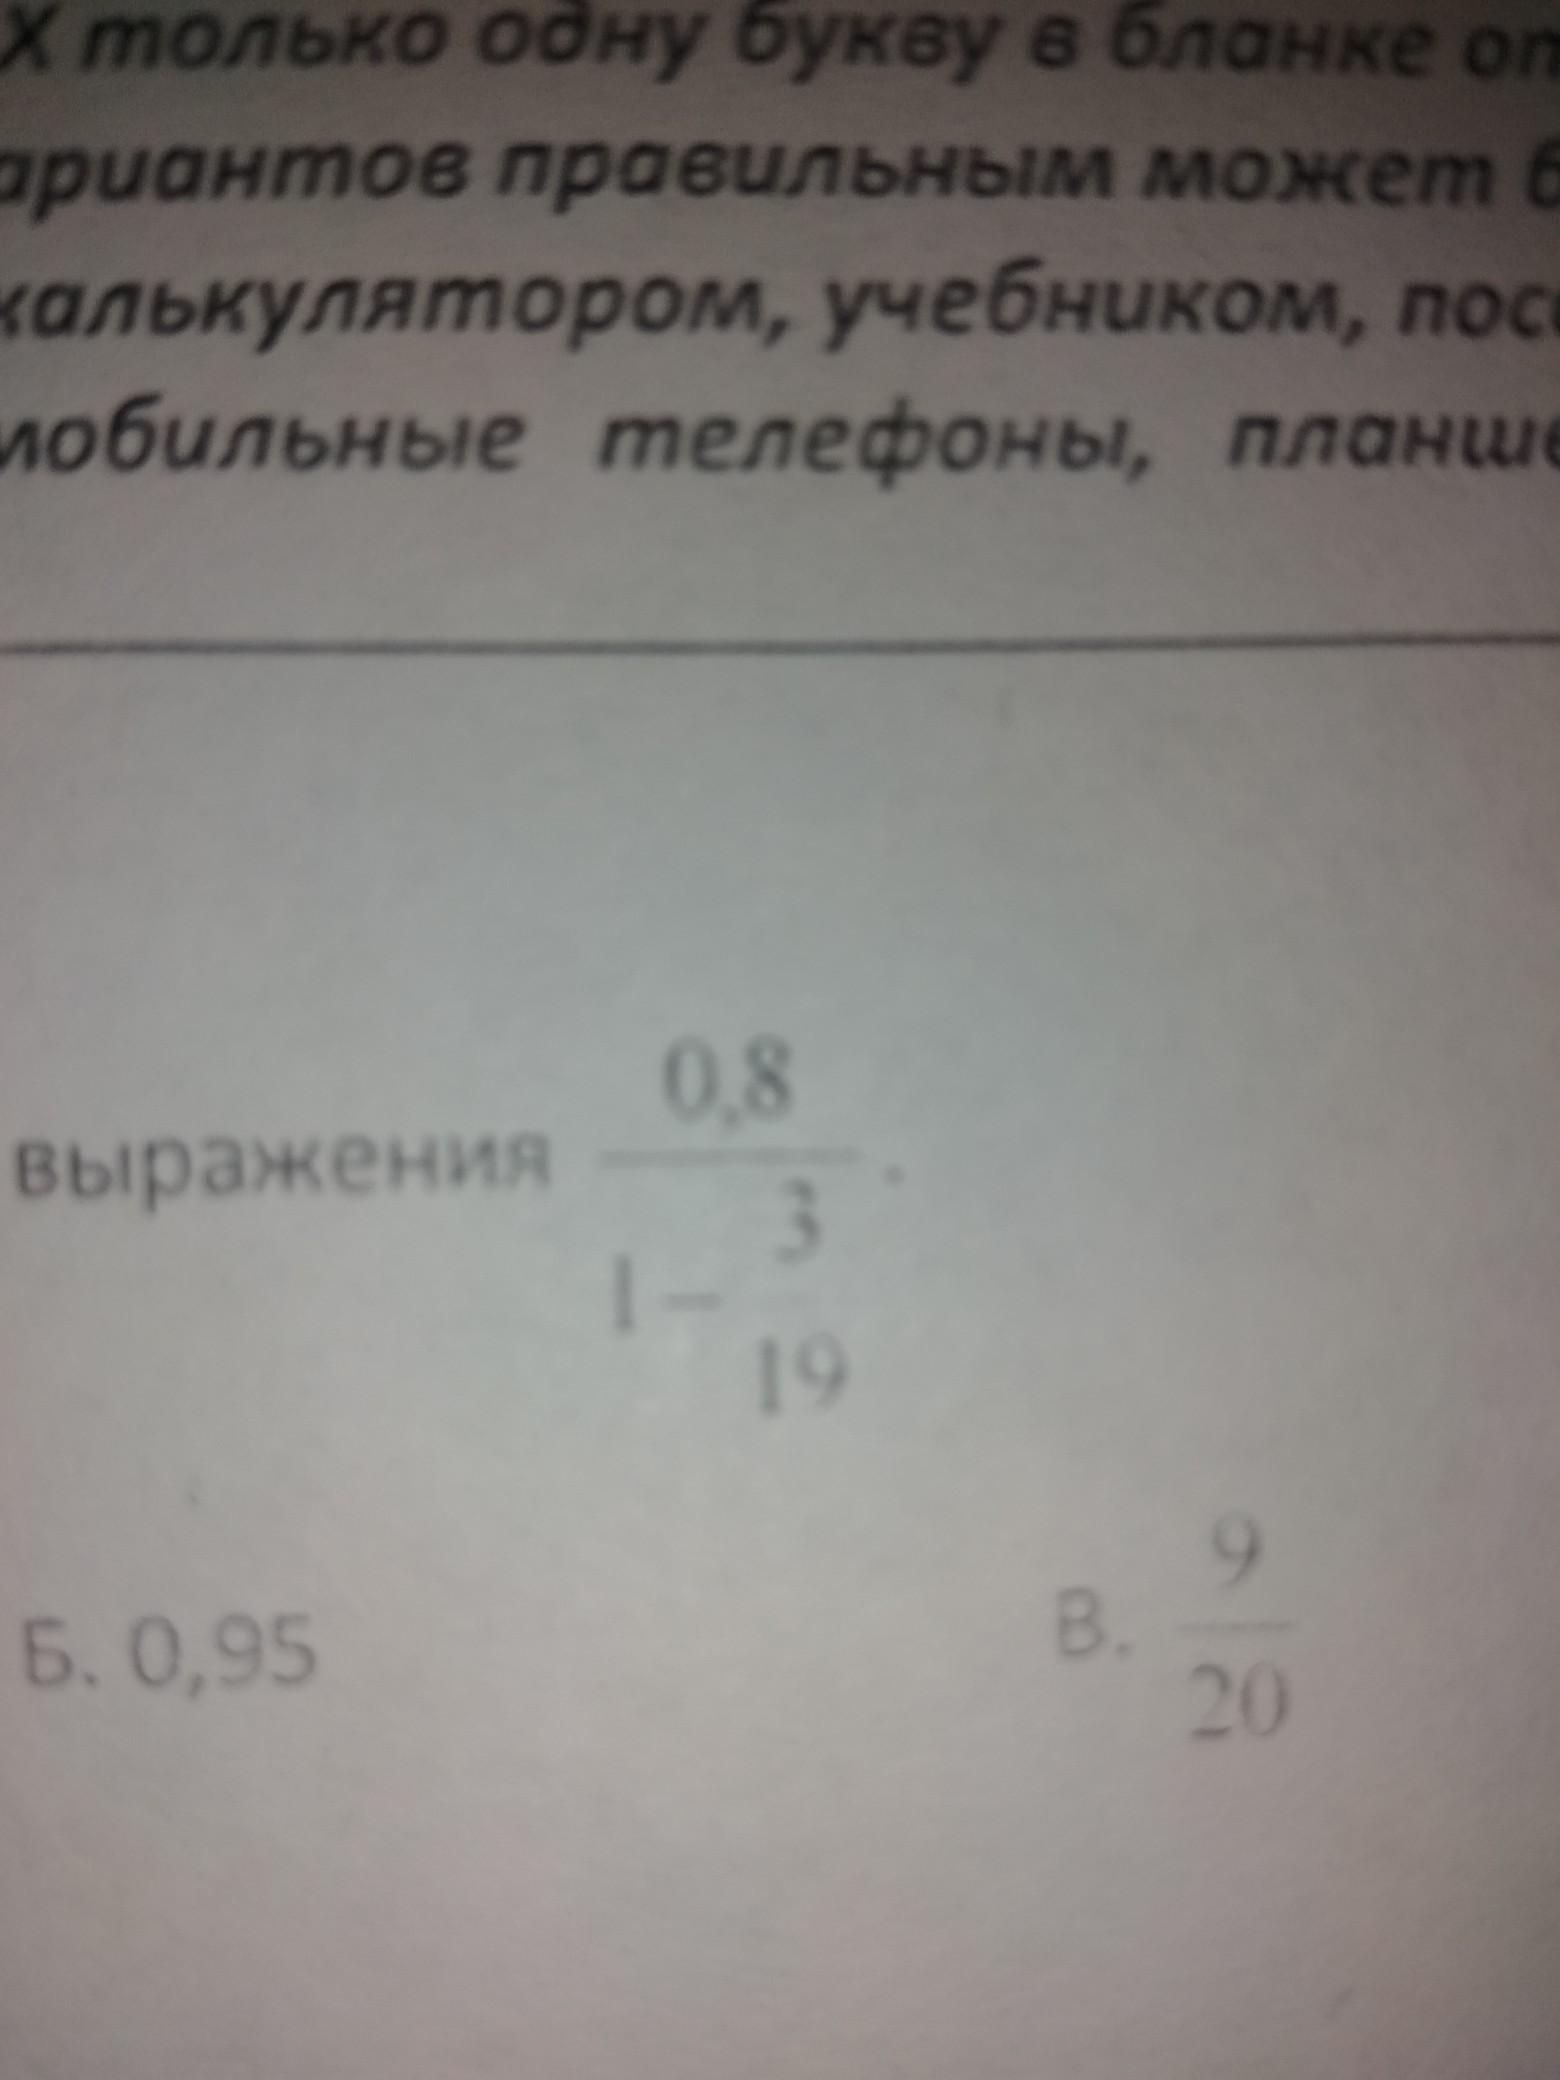 Алгебра калькулятор решение задач решение задач средней хронологической